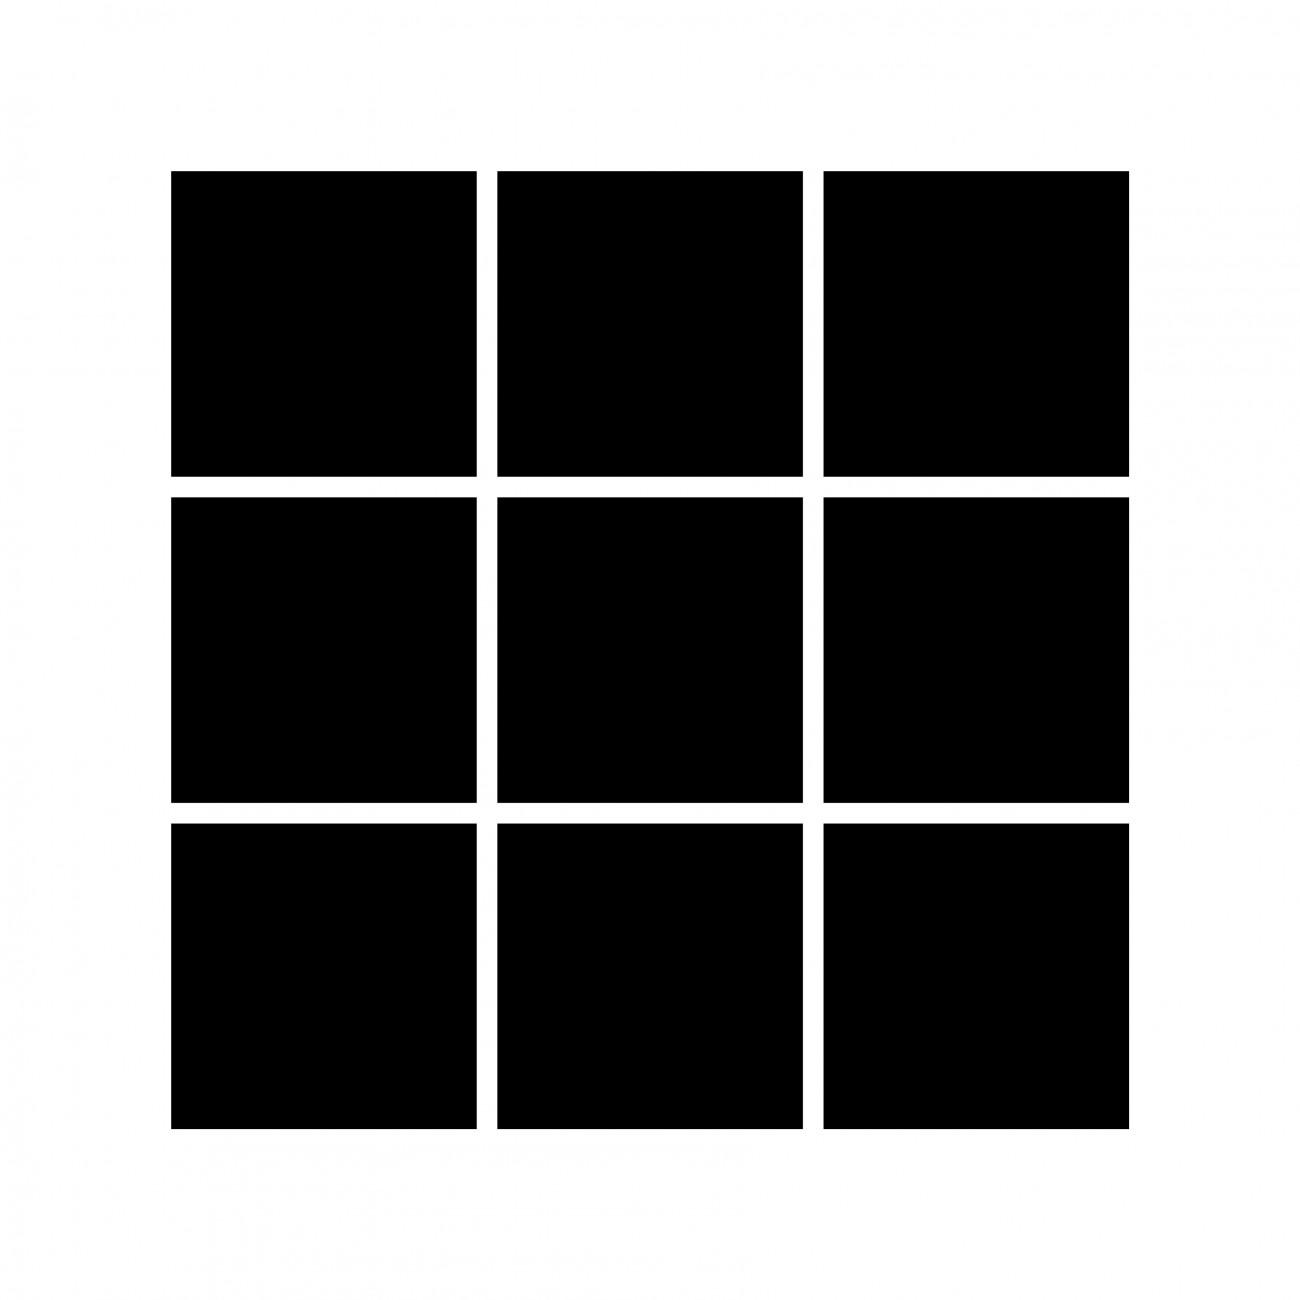 Kvadratisk 01 - 9 bilder